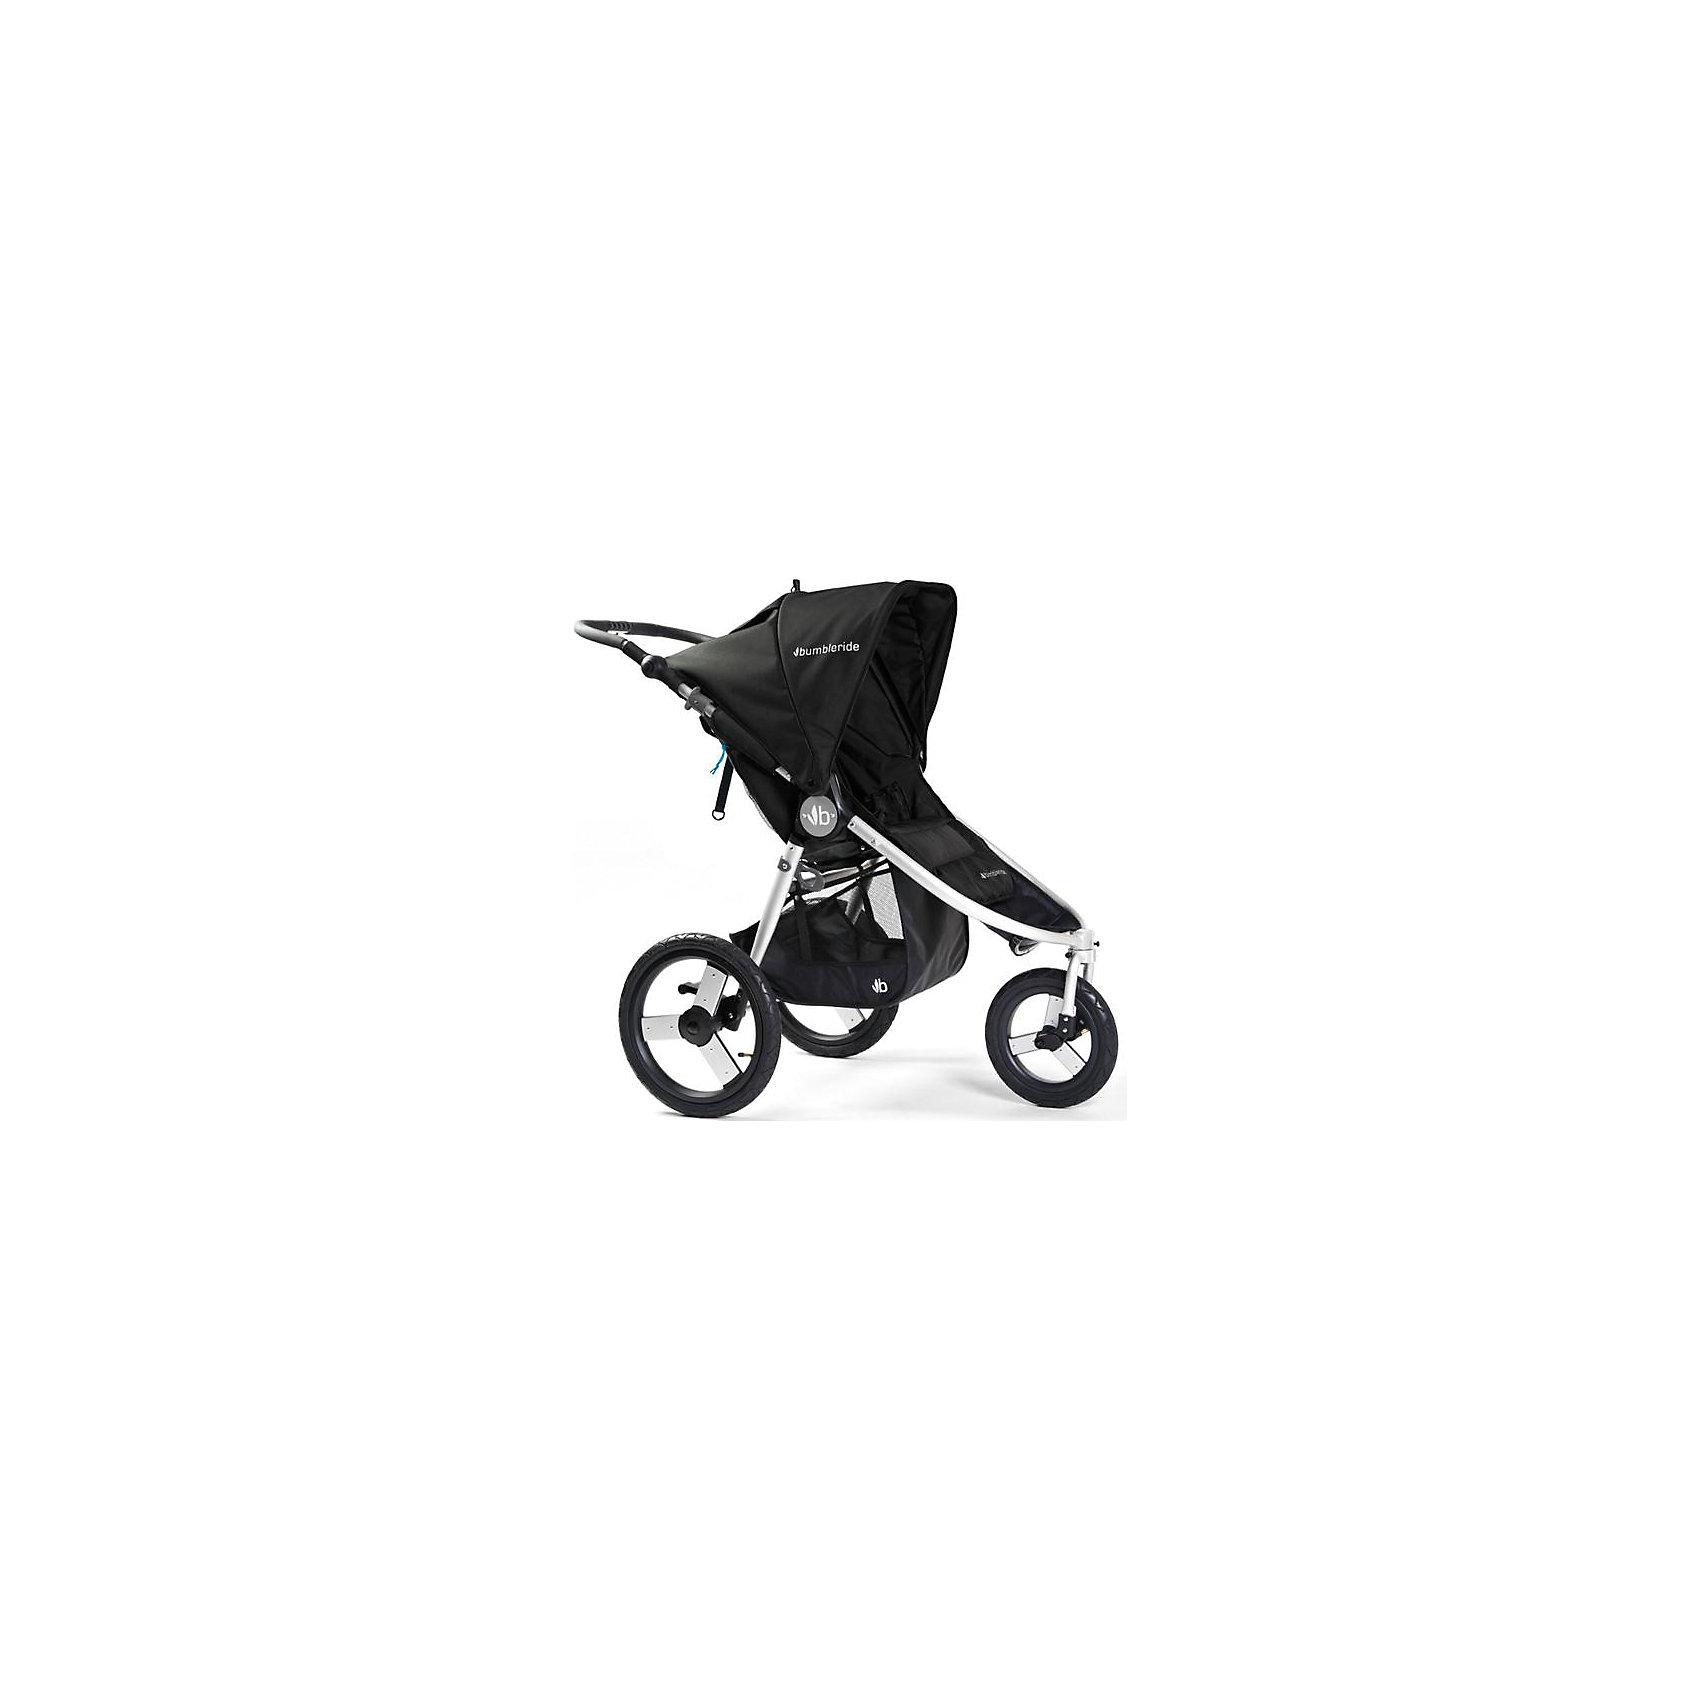 Bumbleride Прогулочная коляска Speed, Bumbleride , silver black